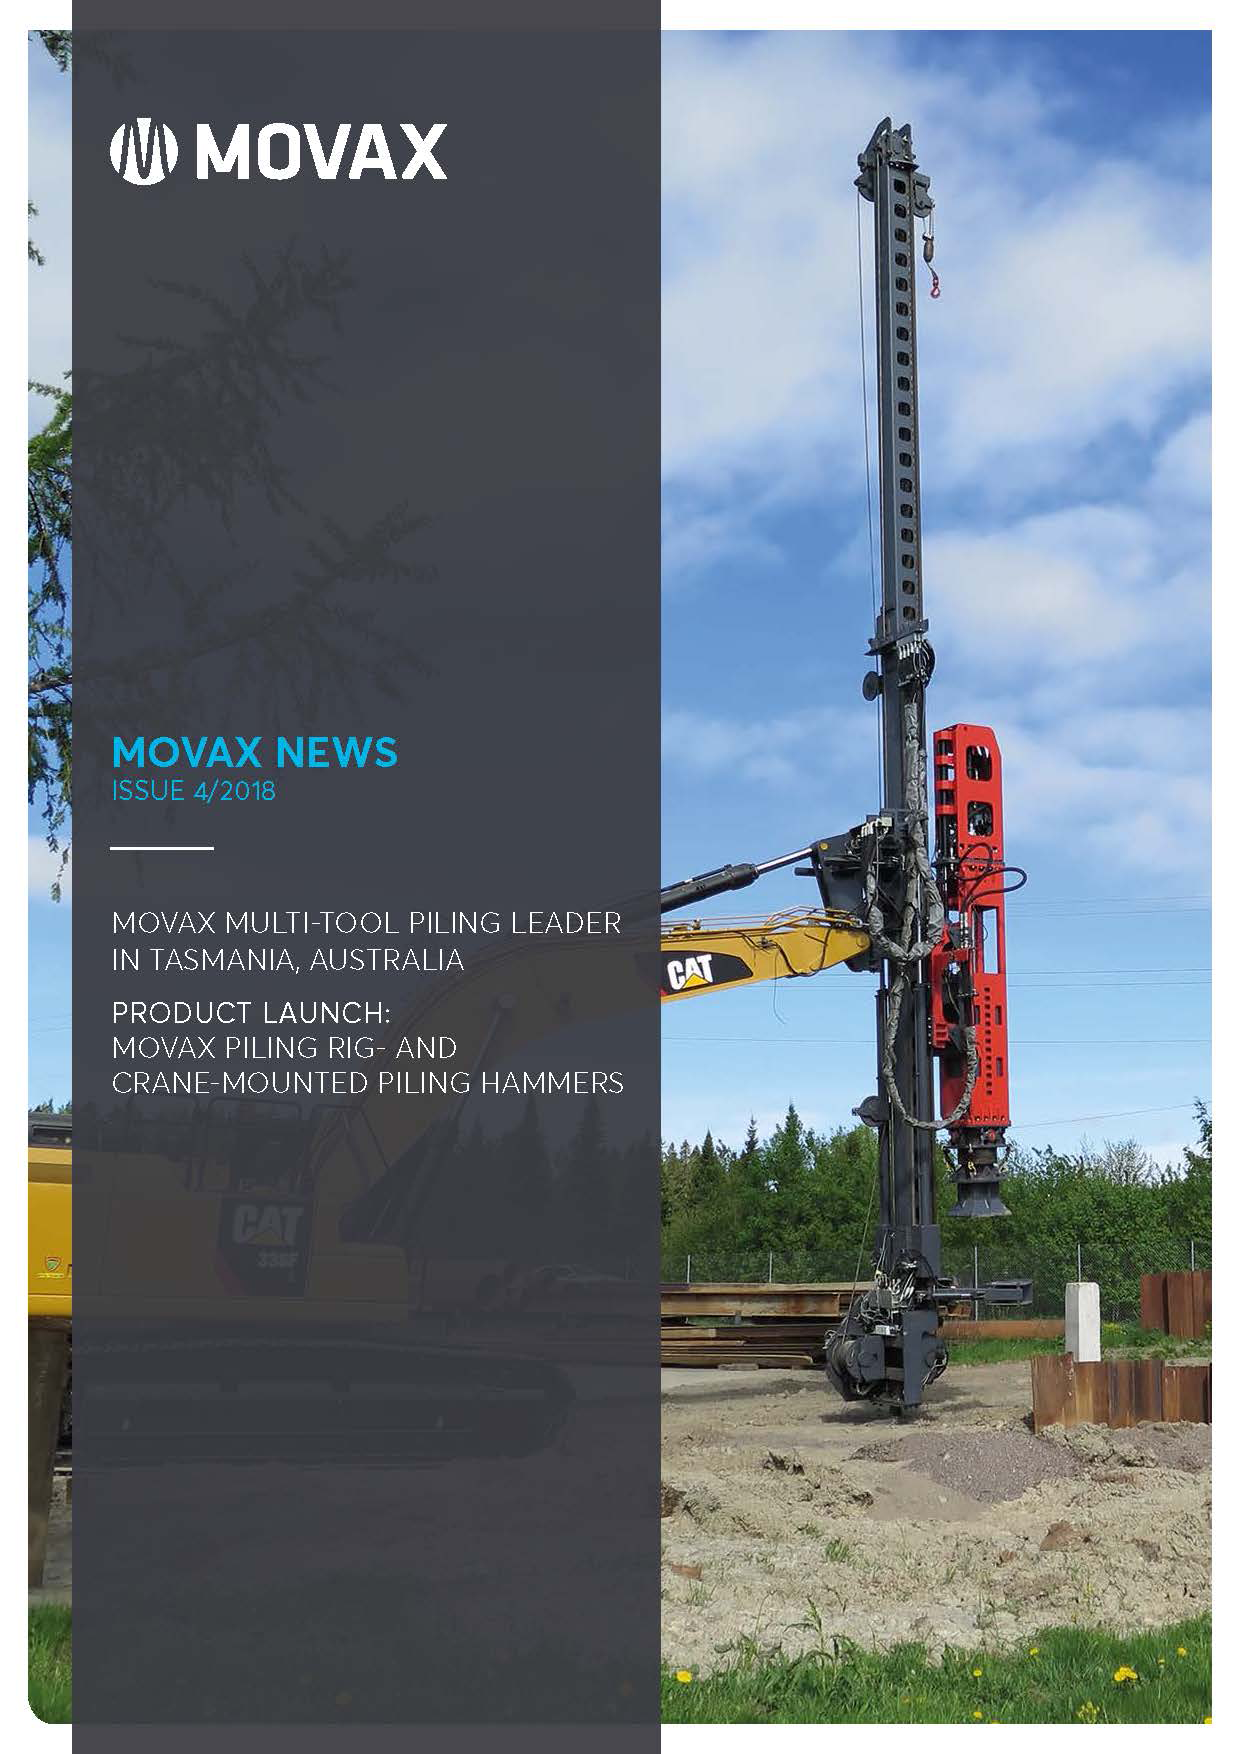 Movax News 04/2018